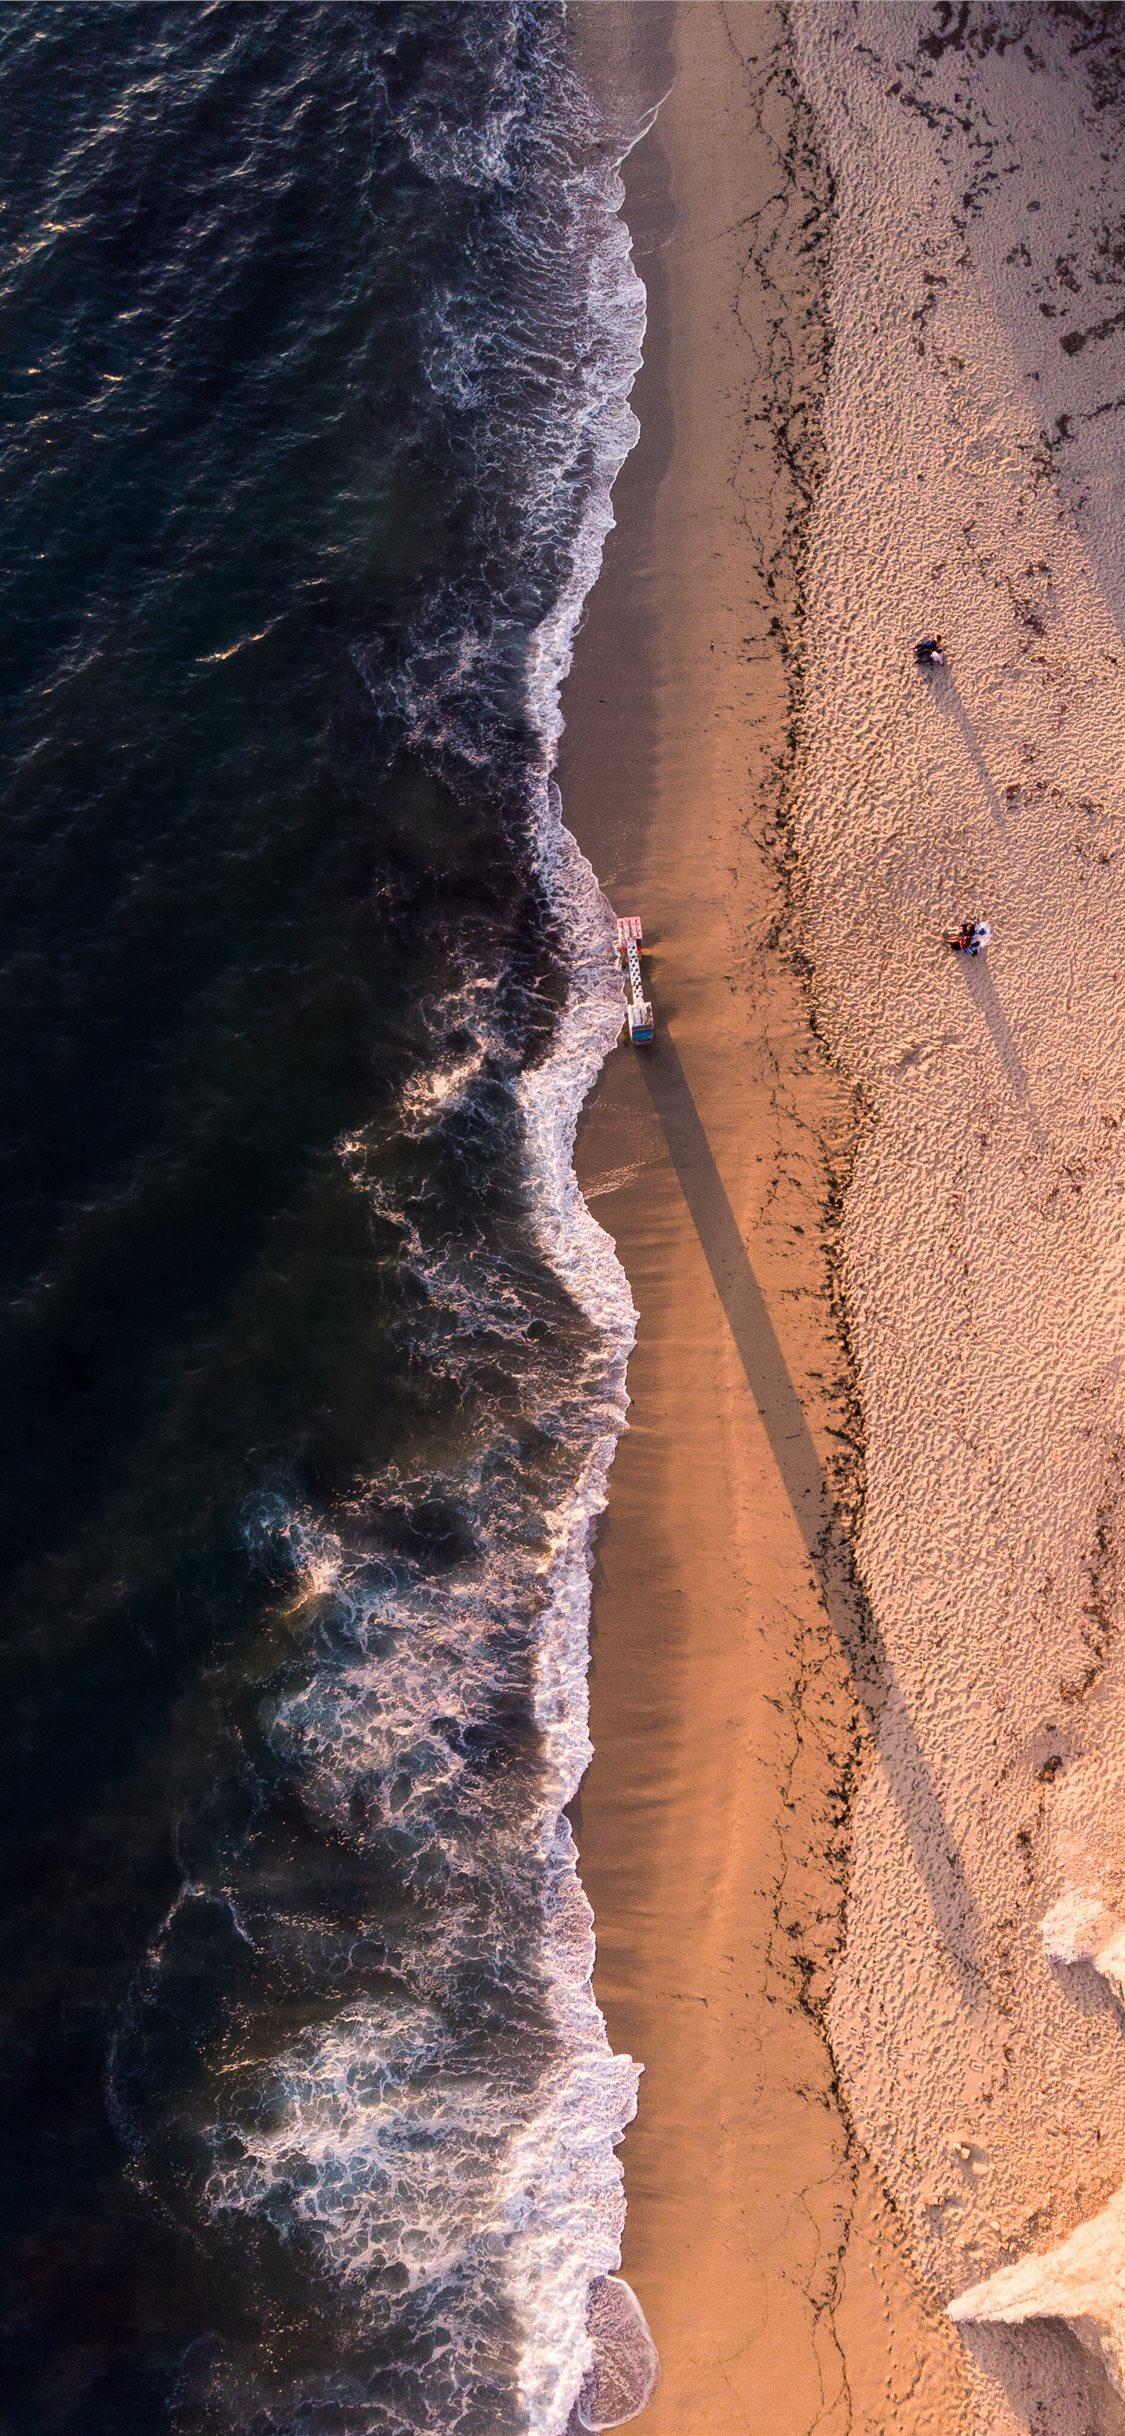 Best Aerial View Iphone X Wallpapers Hd Ilikewallpaper